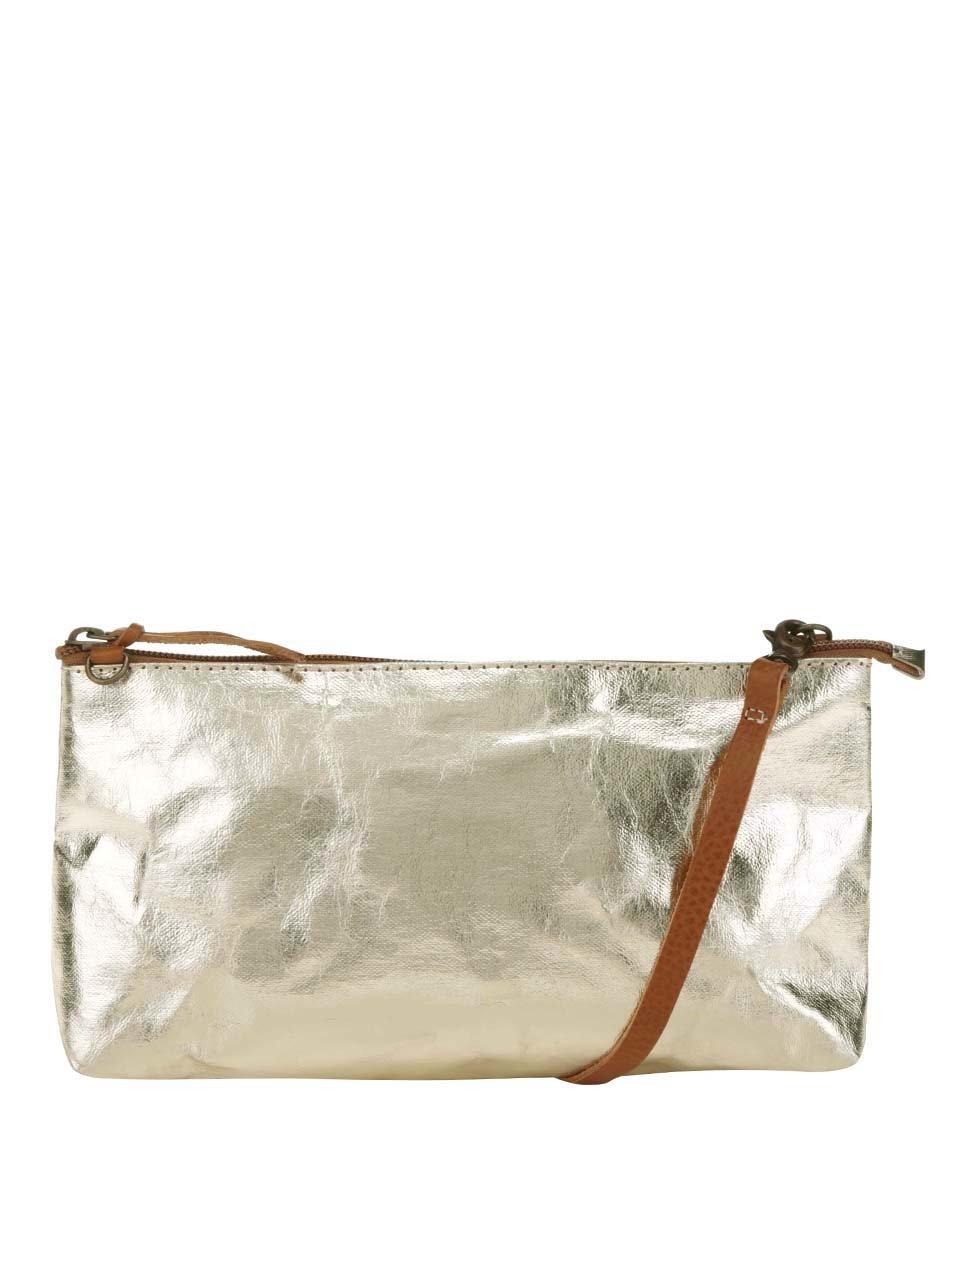 9e9850f748 Crossbody kabelka lístoček v zlatej farbe UASHMAMA® La Busta ...